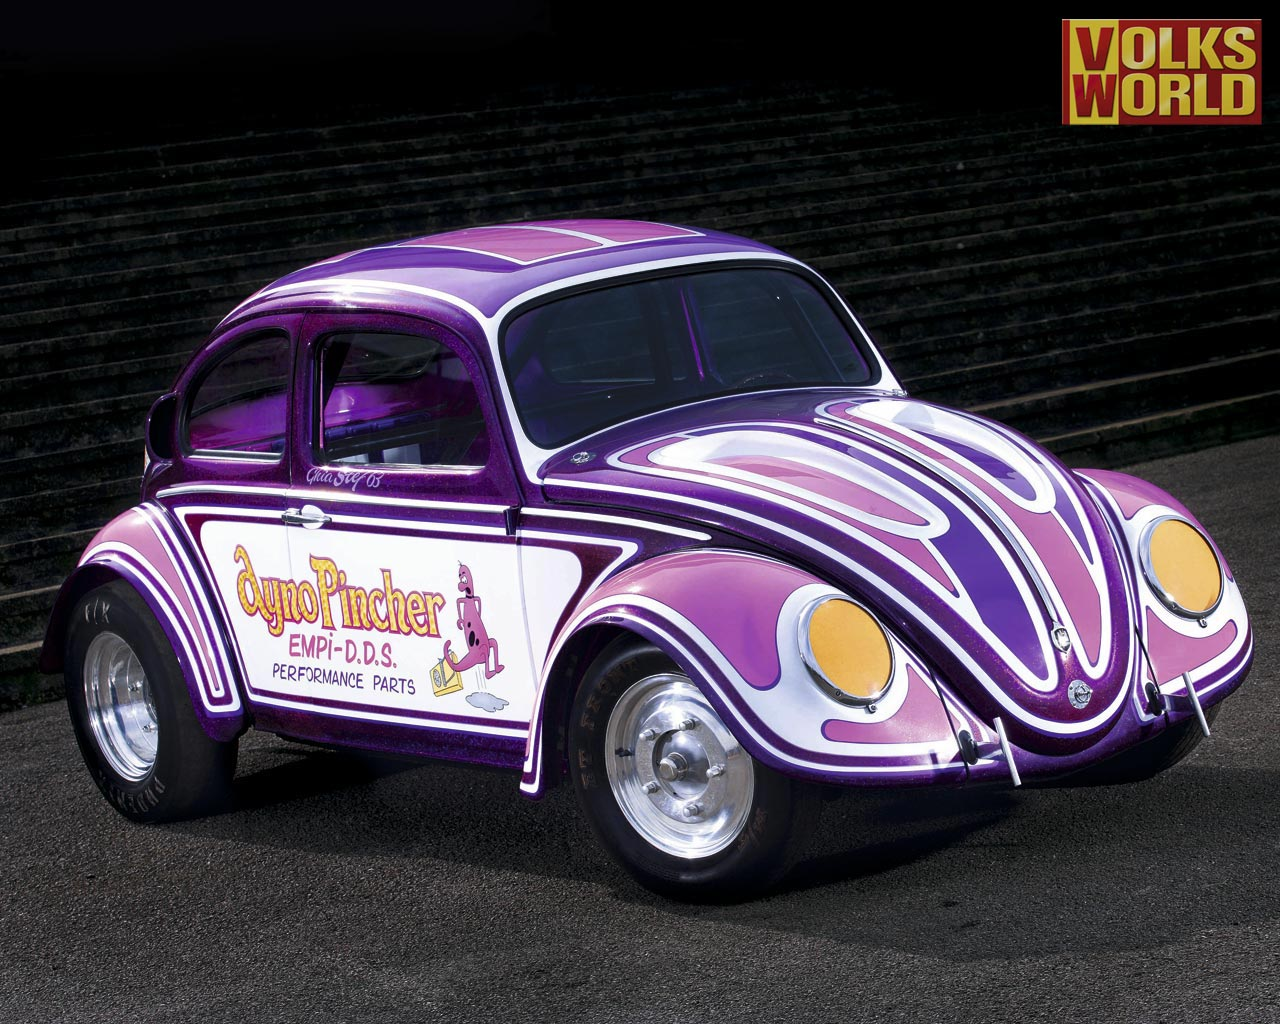 vw beetle wallpaper 7 normal54 1280x1024